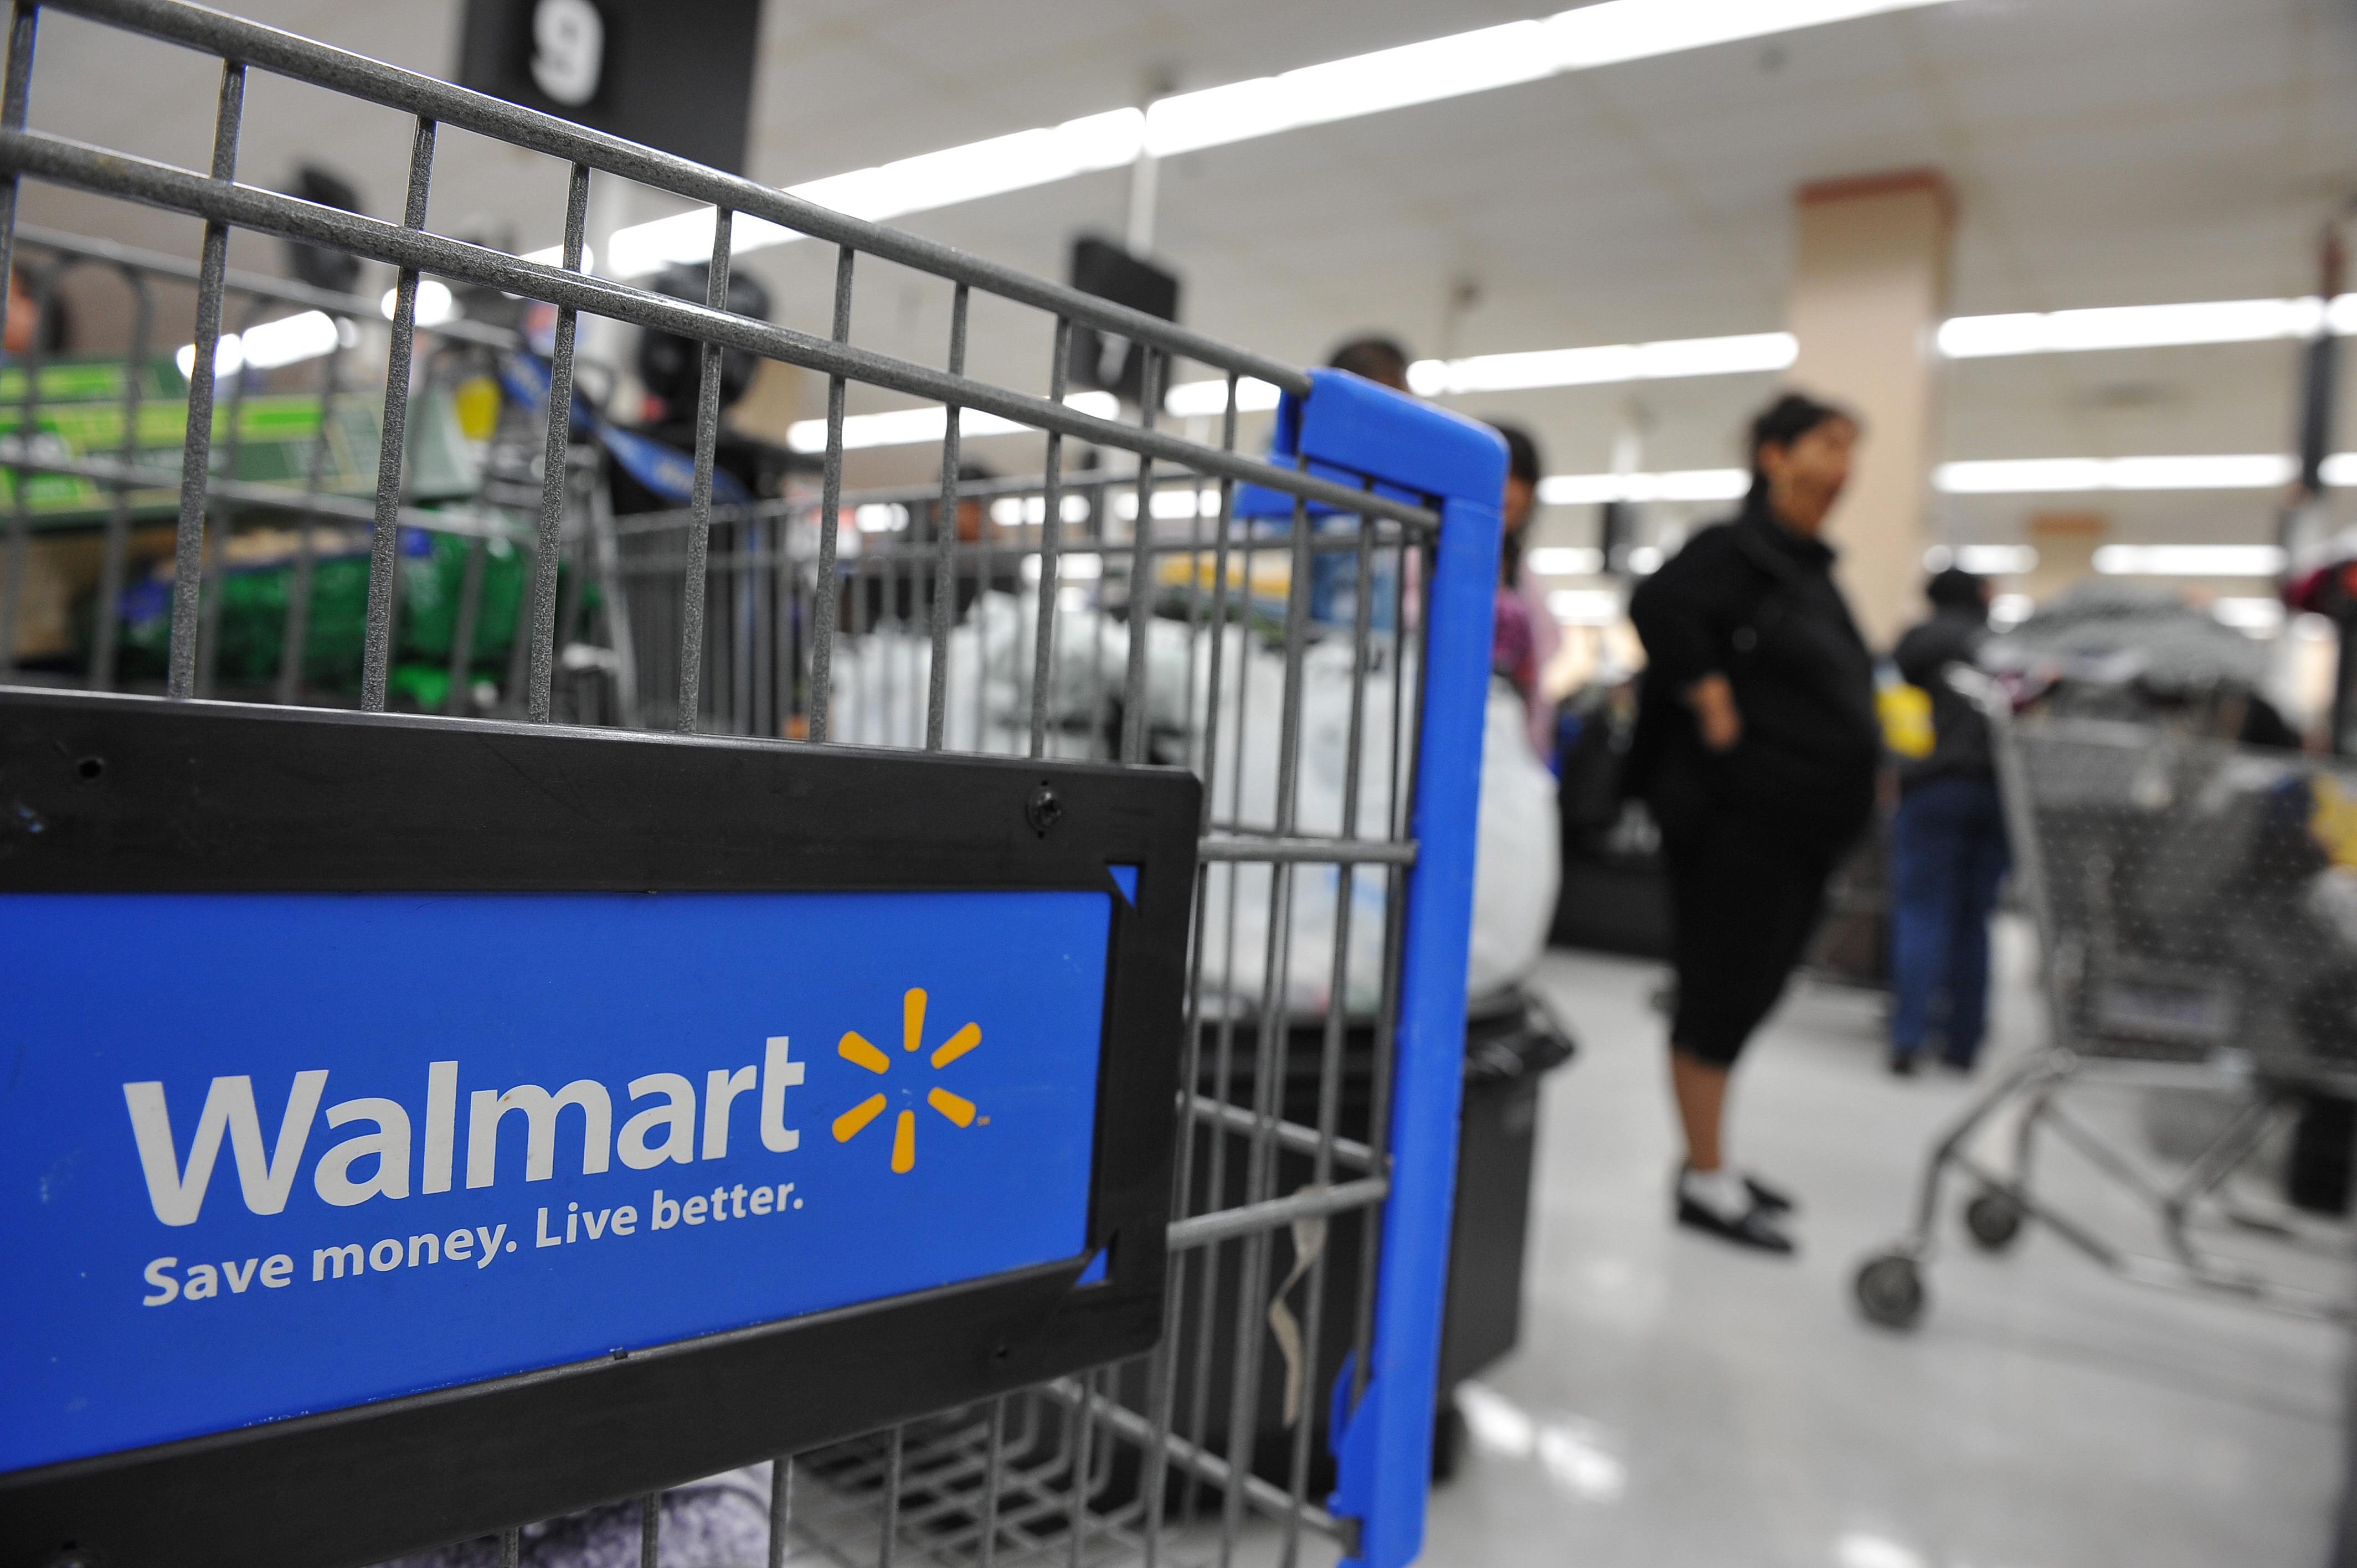 Walmart is doing more to stop gun violence than Congress